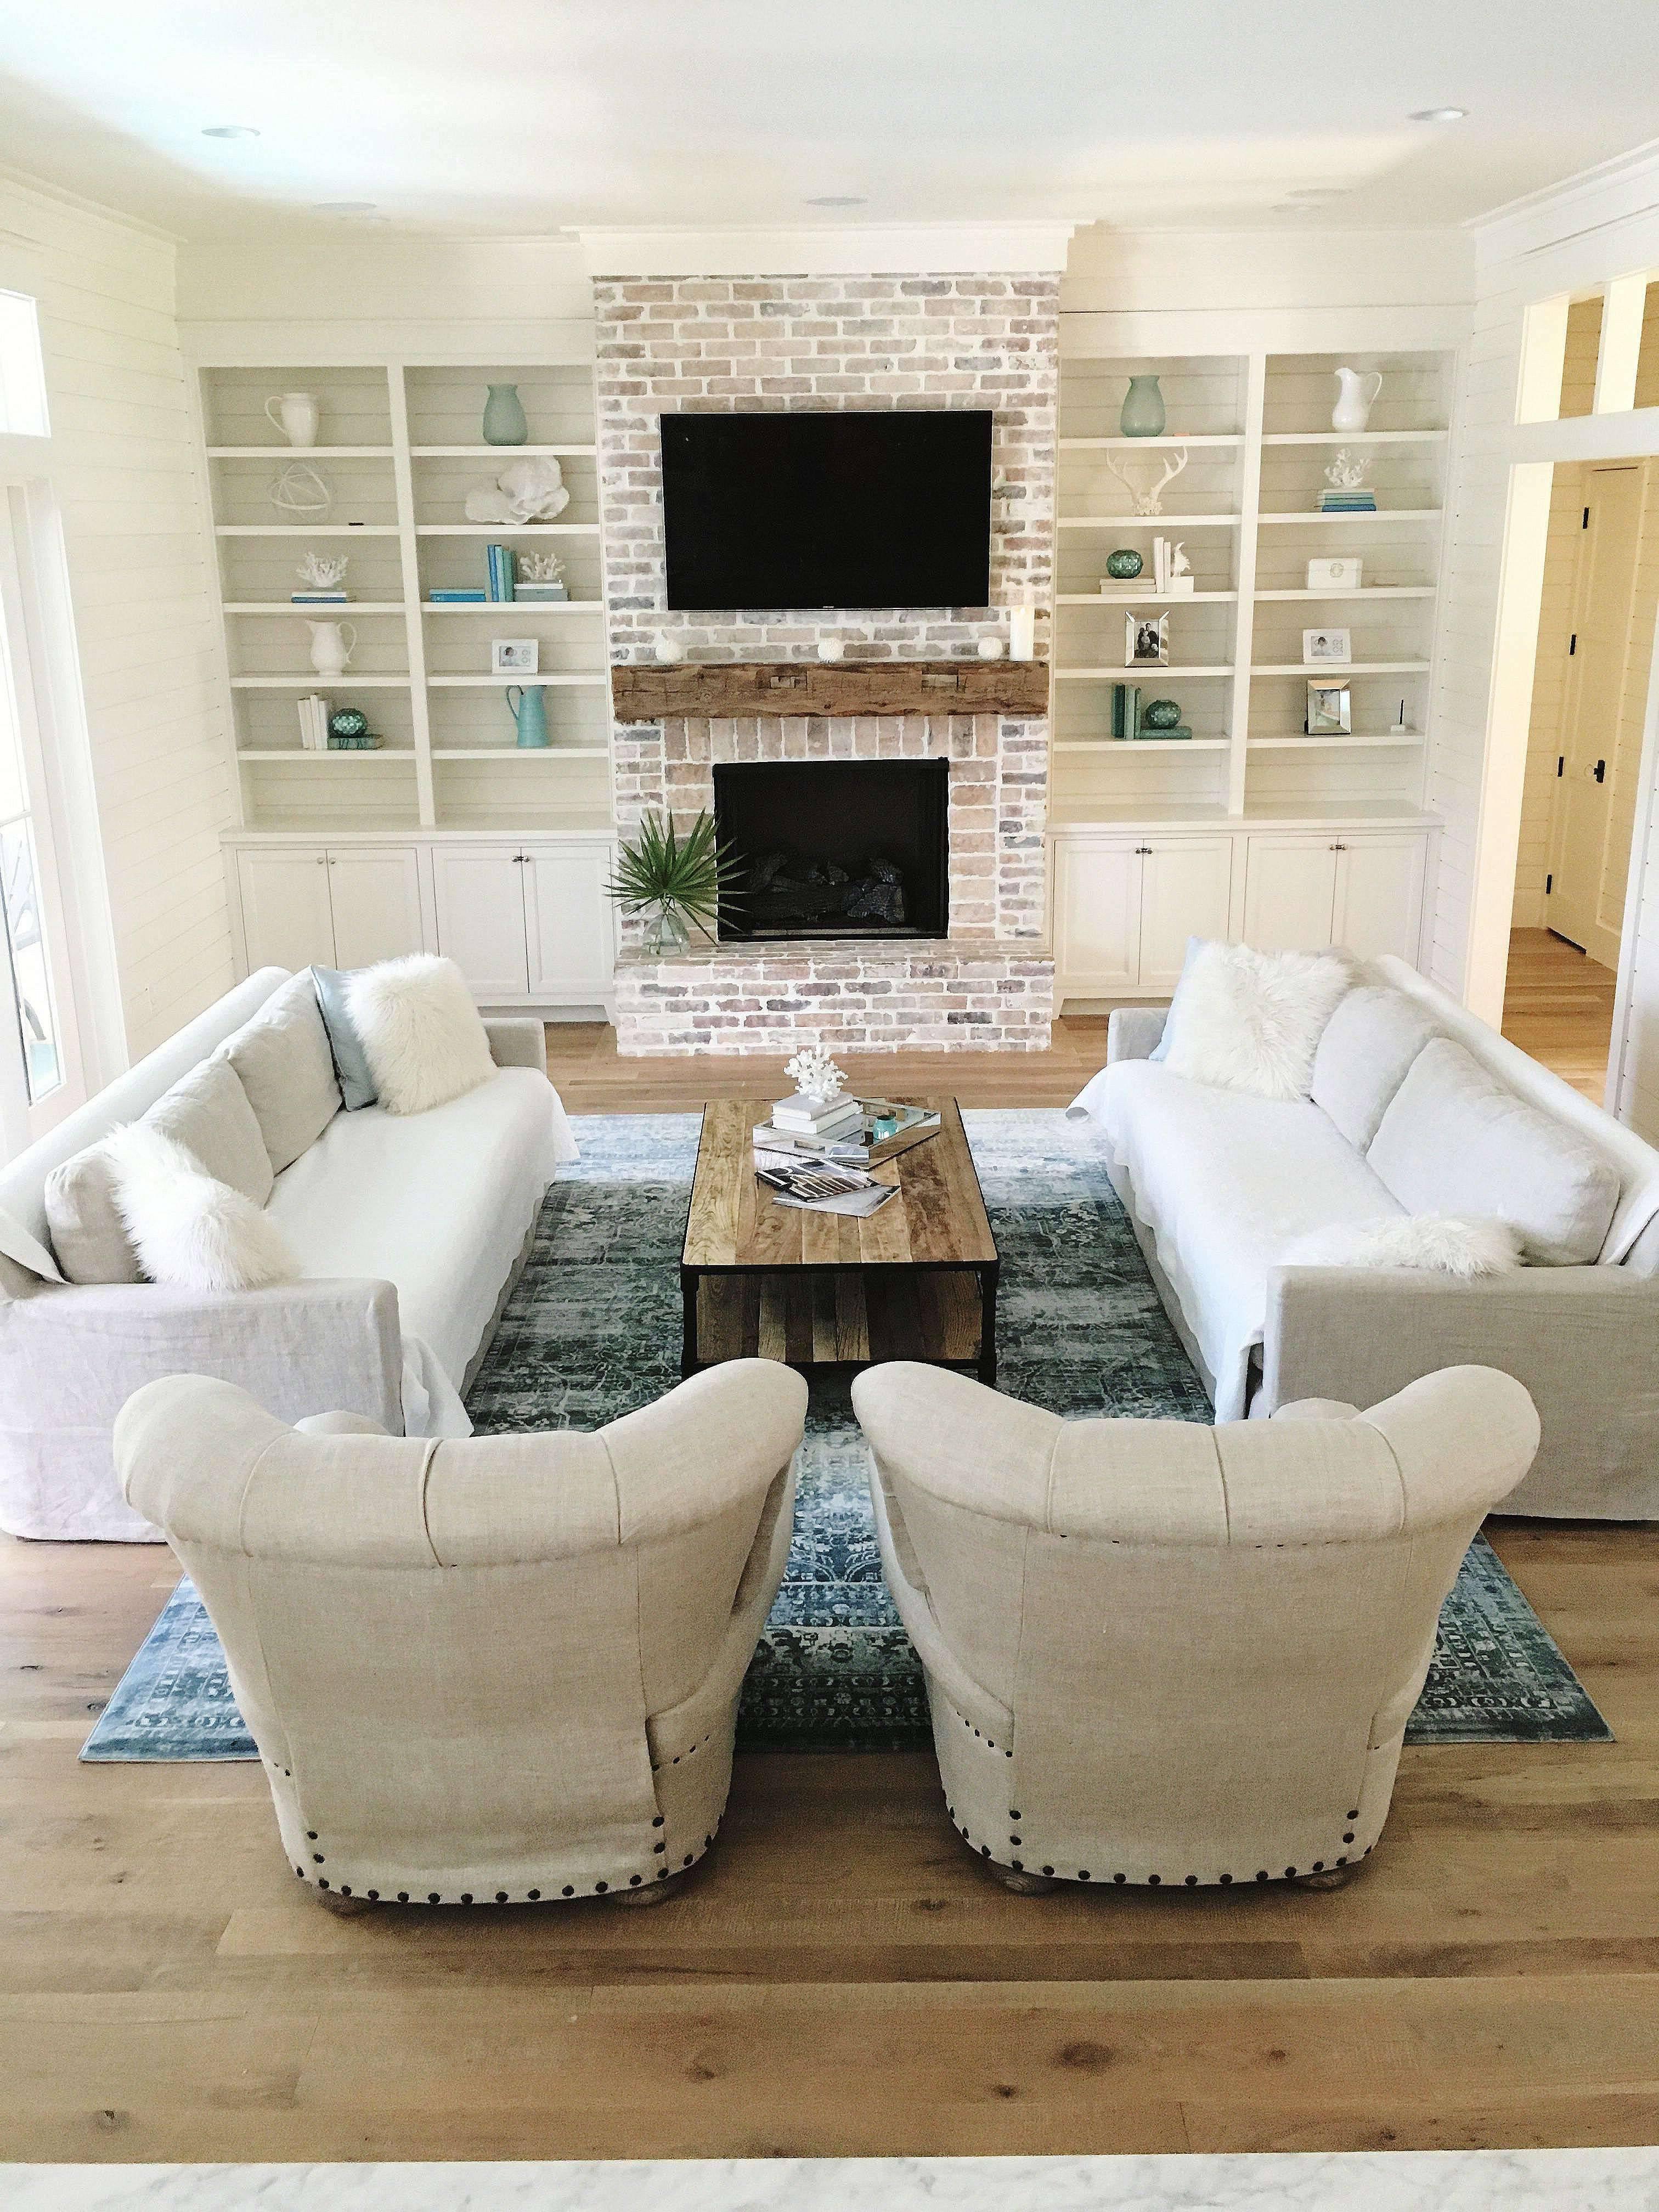 contemporary home interiors pictures modern living room furniture new gunstige sofa macys furniture 0d scheme modern home decorating